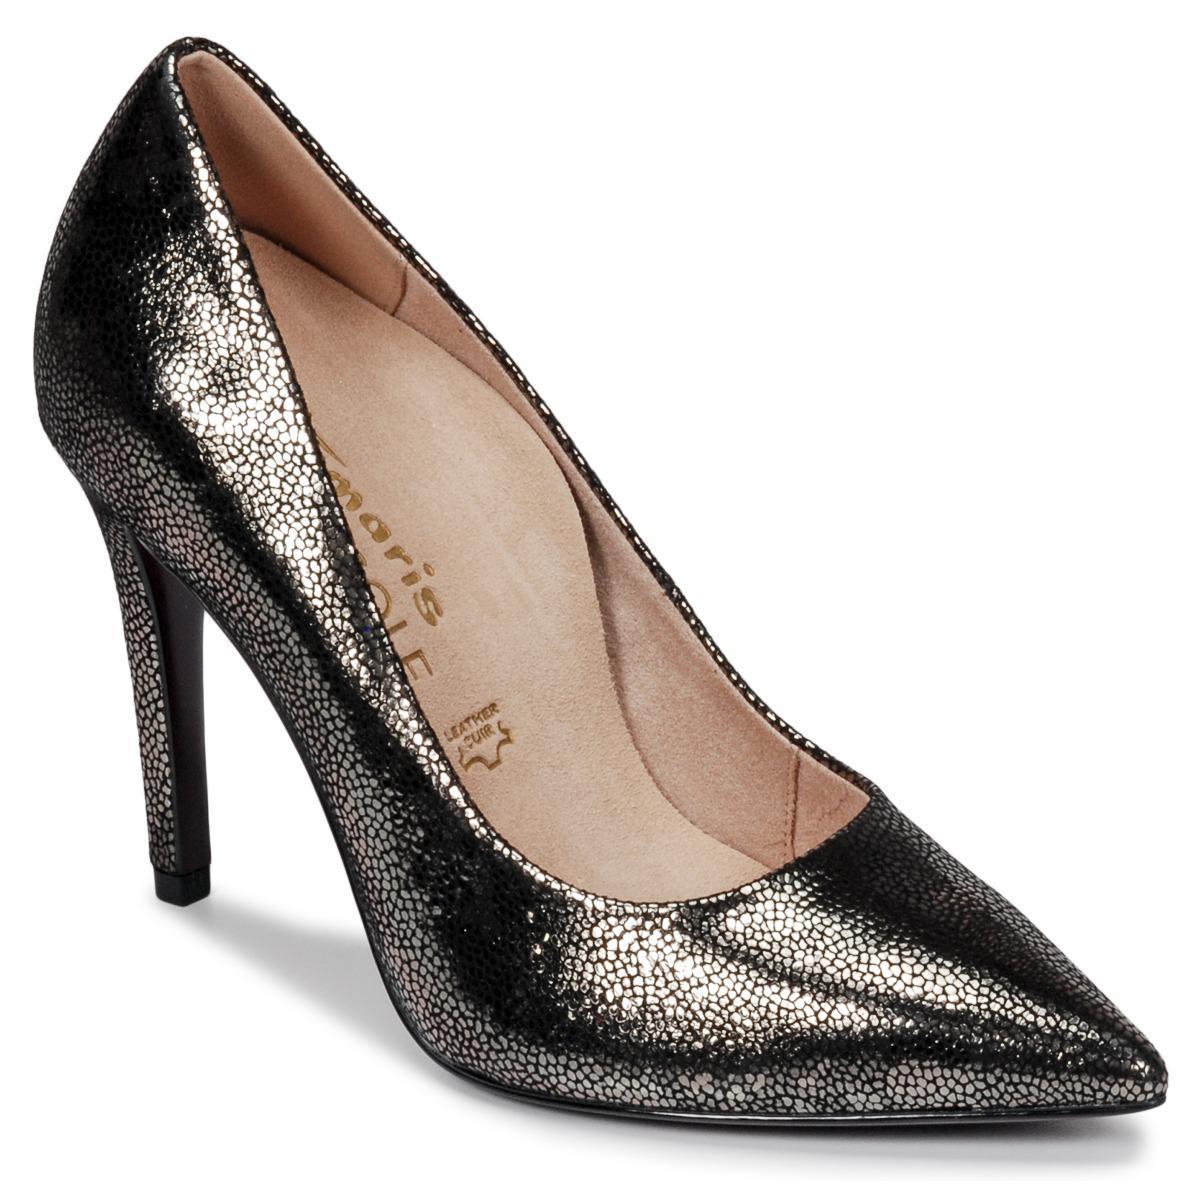 74a4ee7f4f2 Lyst - 22439 femmes Chaussures escarpins en Noir Tamaris en coloris ...